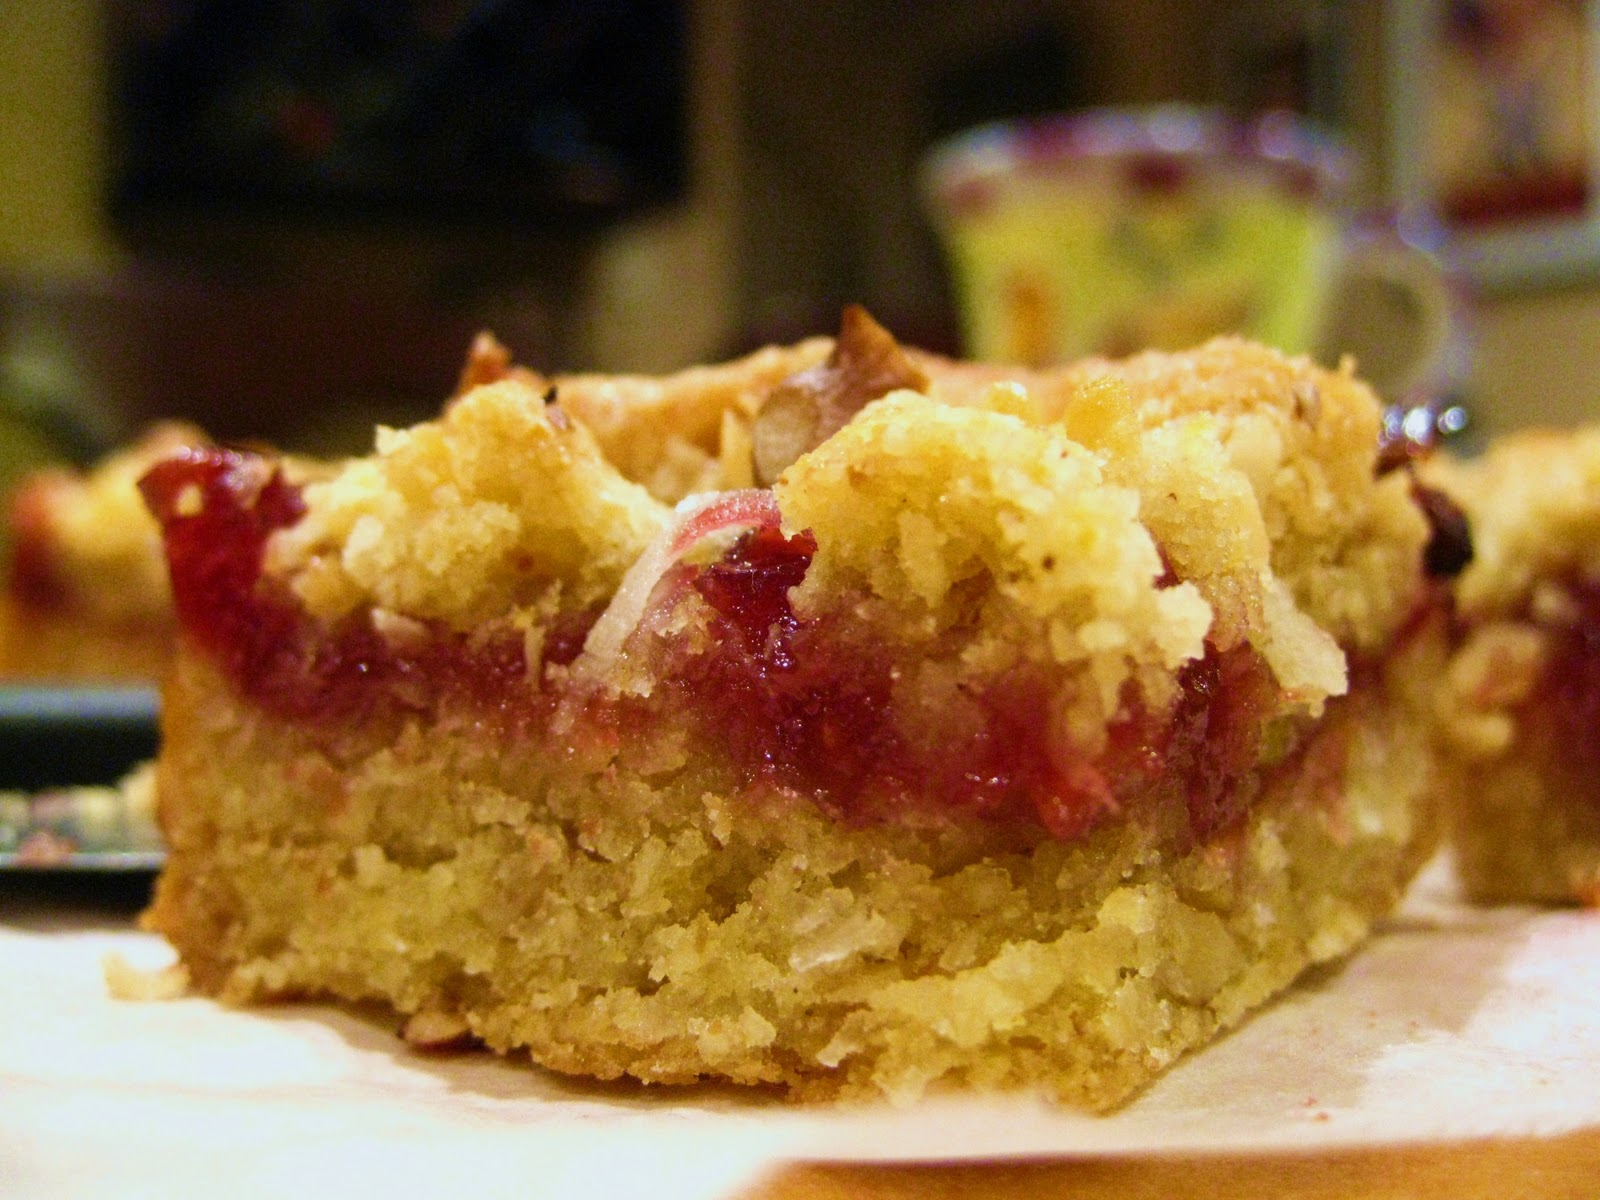 Cara's Cravings » Passover Prep Series: Grandma's Raspberry Squares